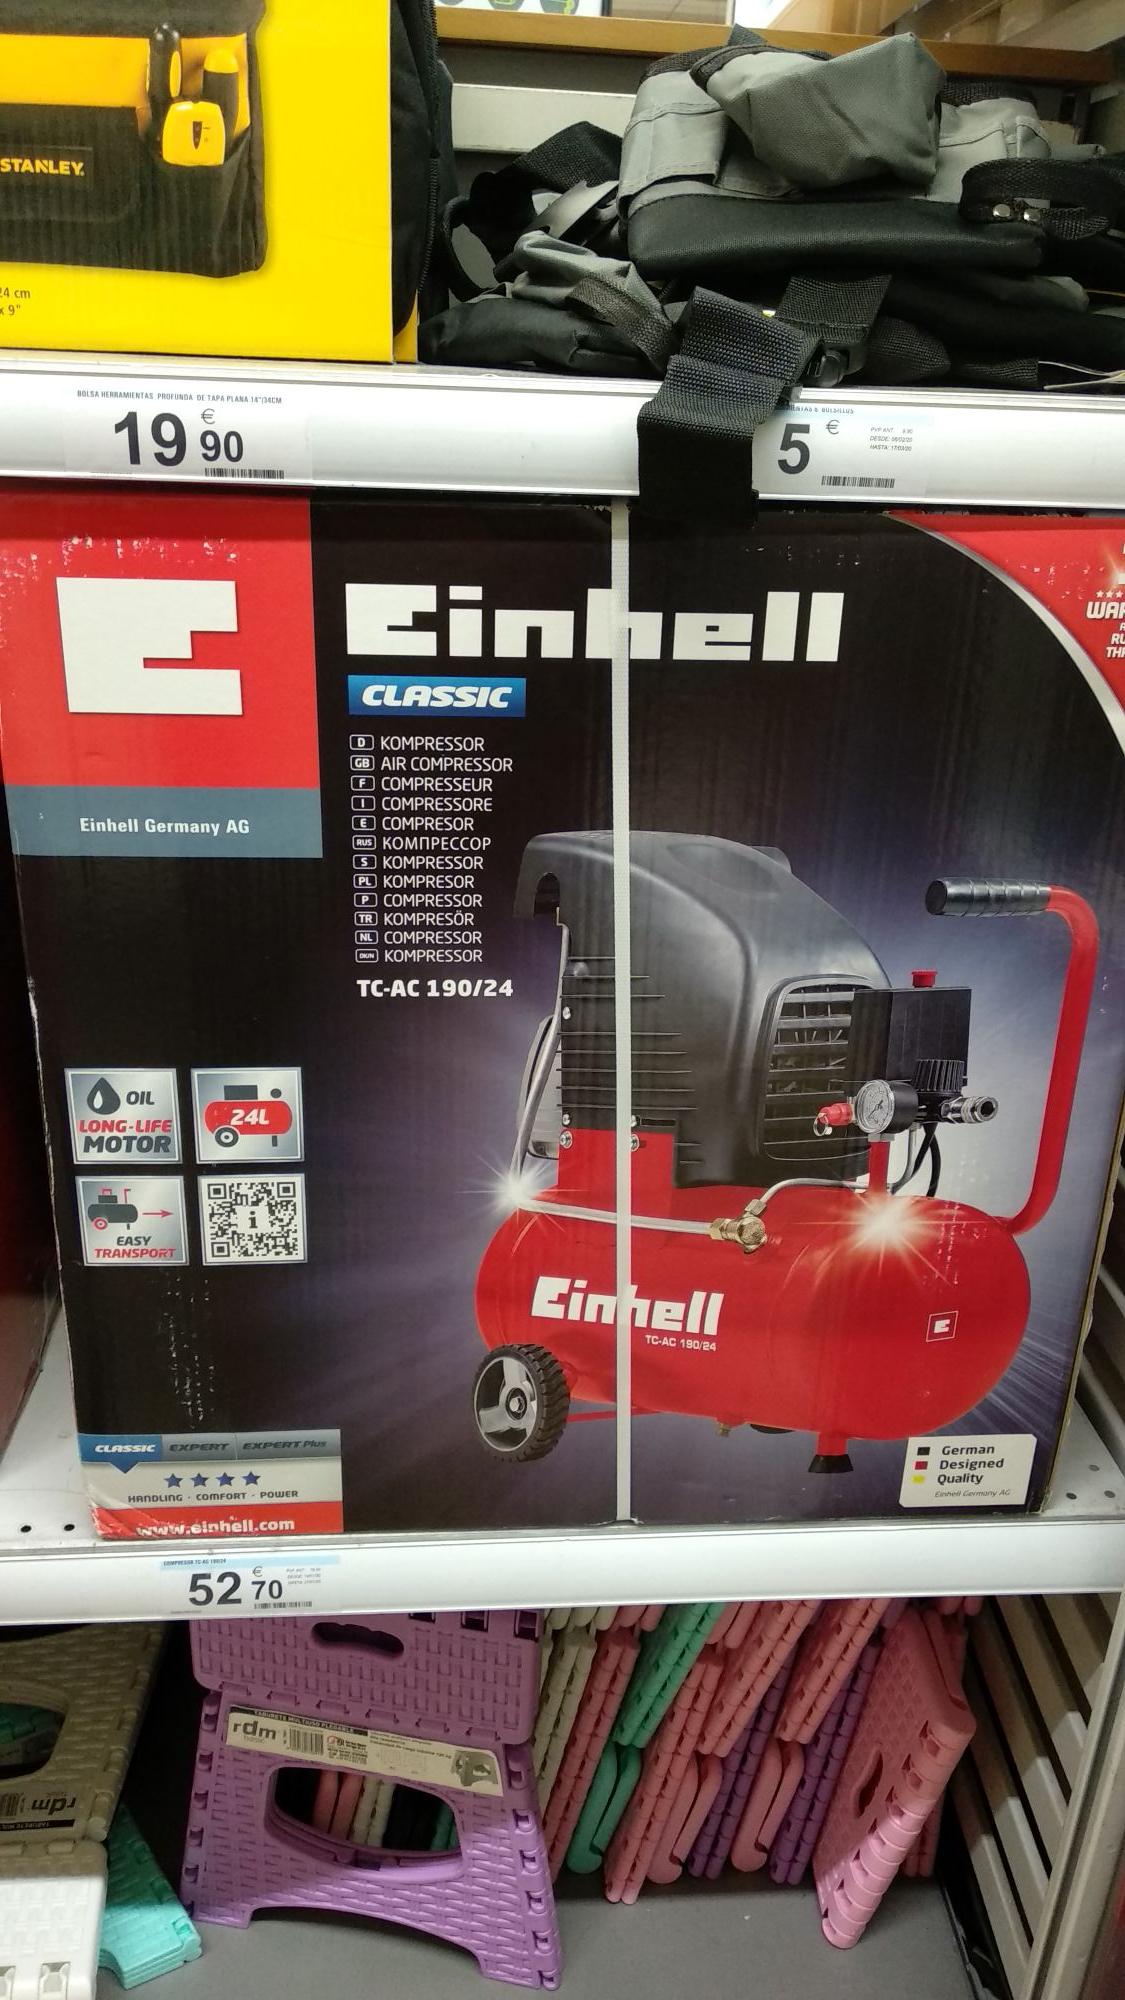 Compresor de aire Einhell 190/24 8 bares 1'5kw en Carrefour de Sestao